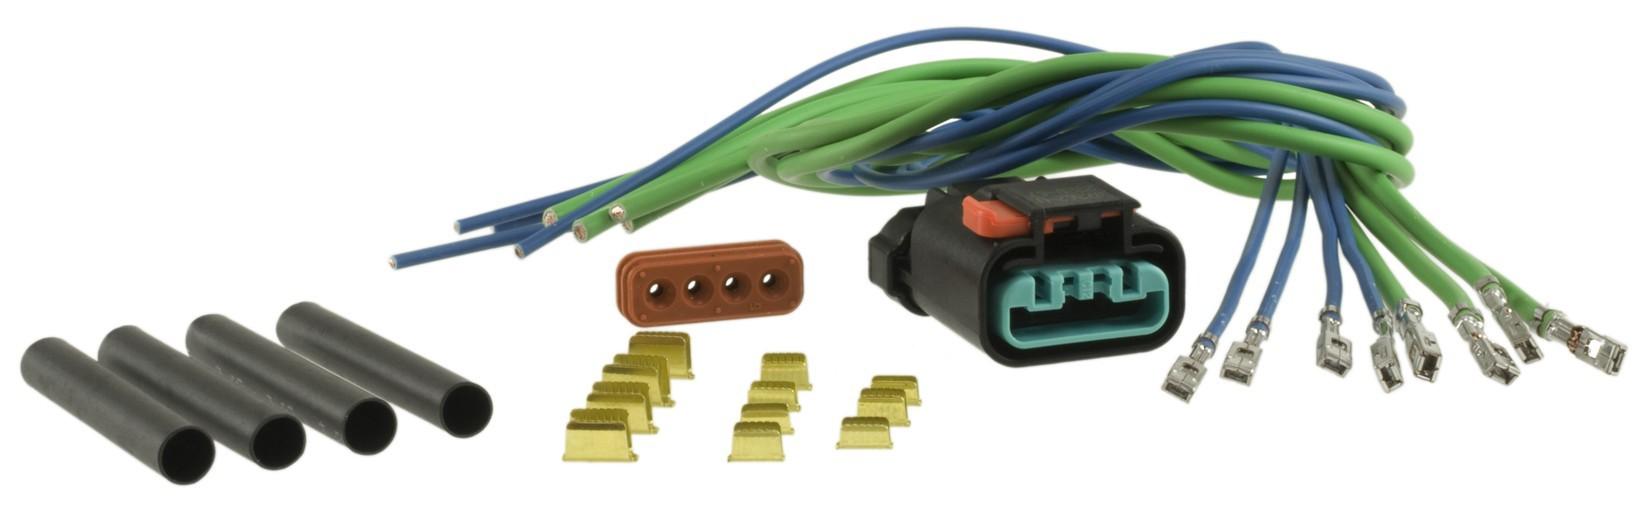 WELLS - Evaporative Emissions System Leak Detection Pump Connector - WEL 861